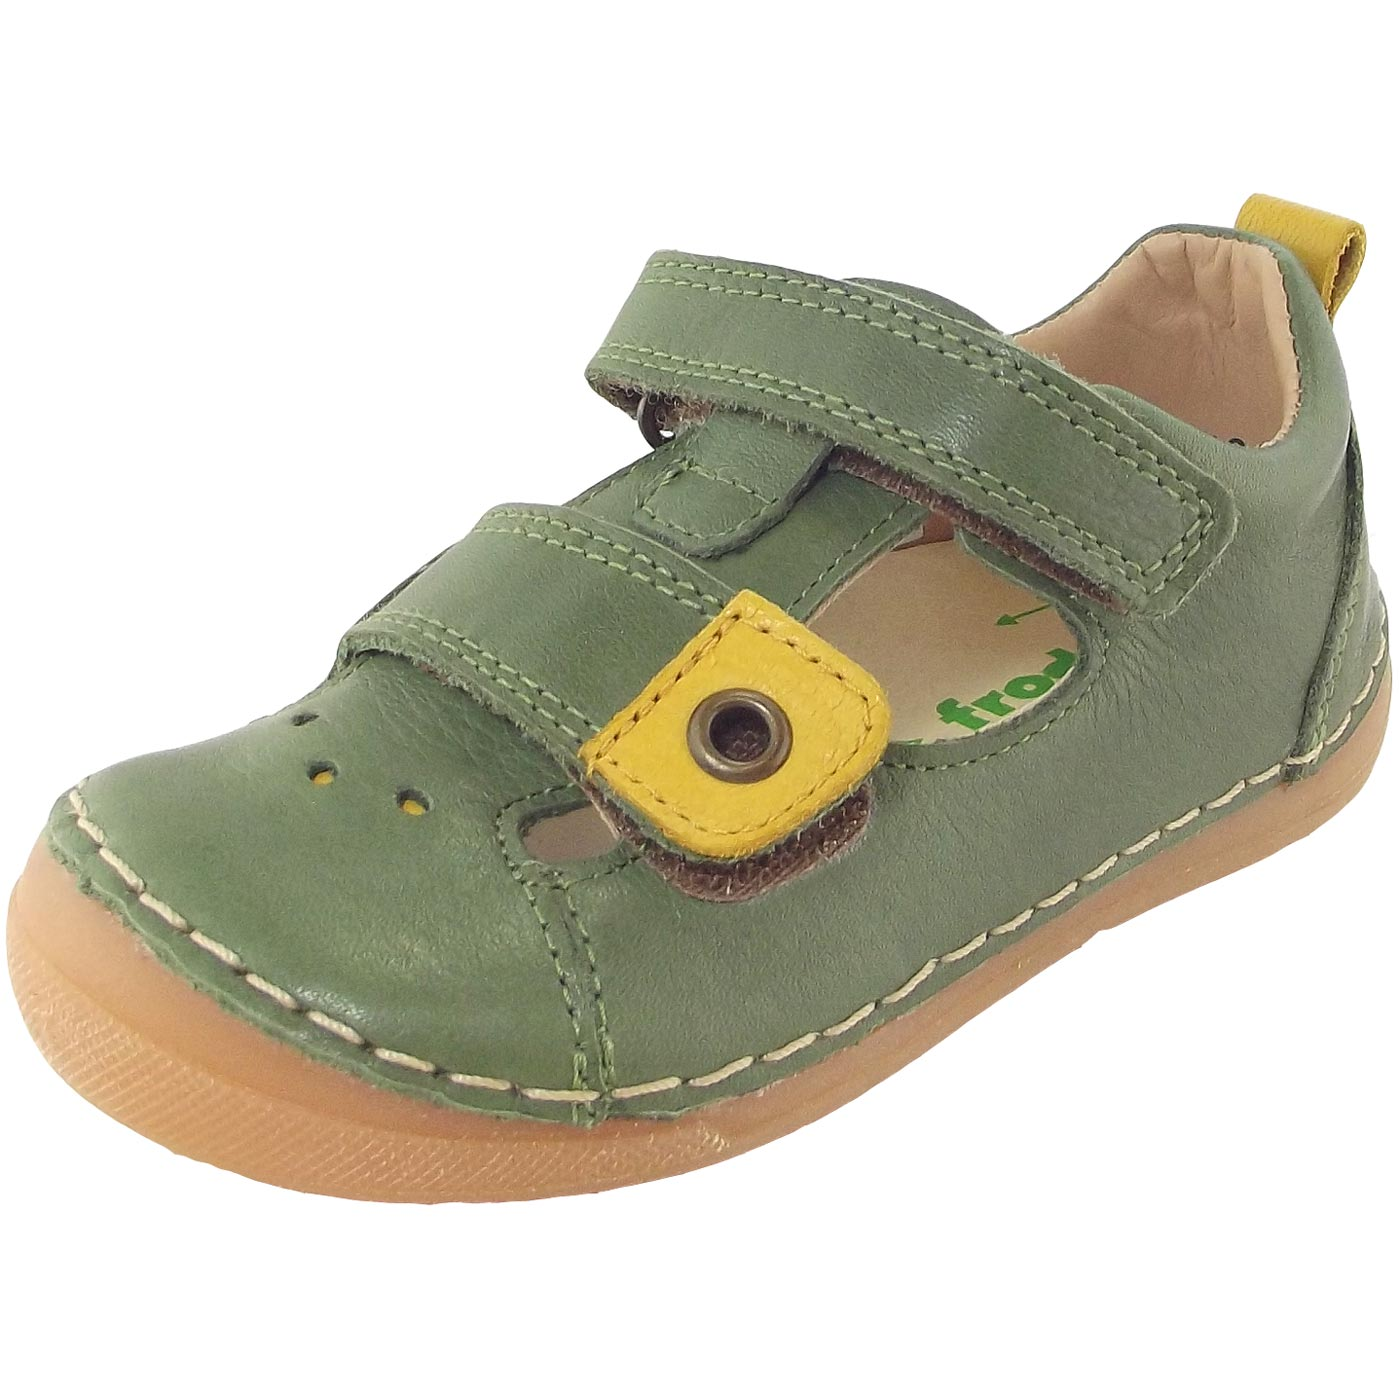 bcc185cdd79c Froddo G2150074 Toddler Sandals dark green